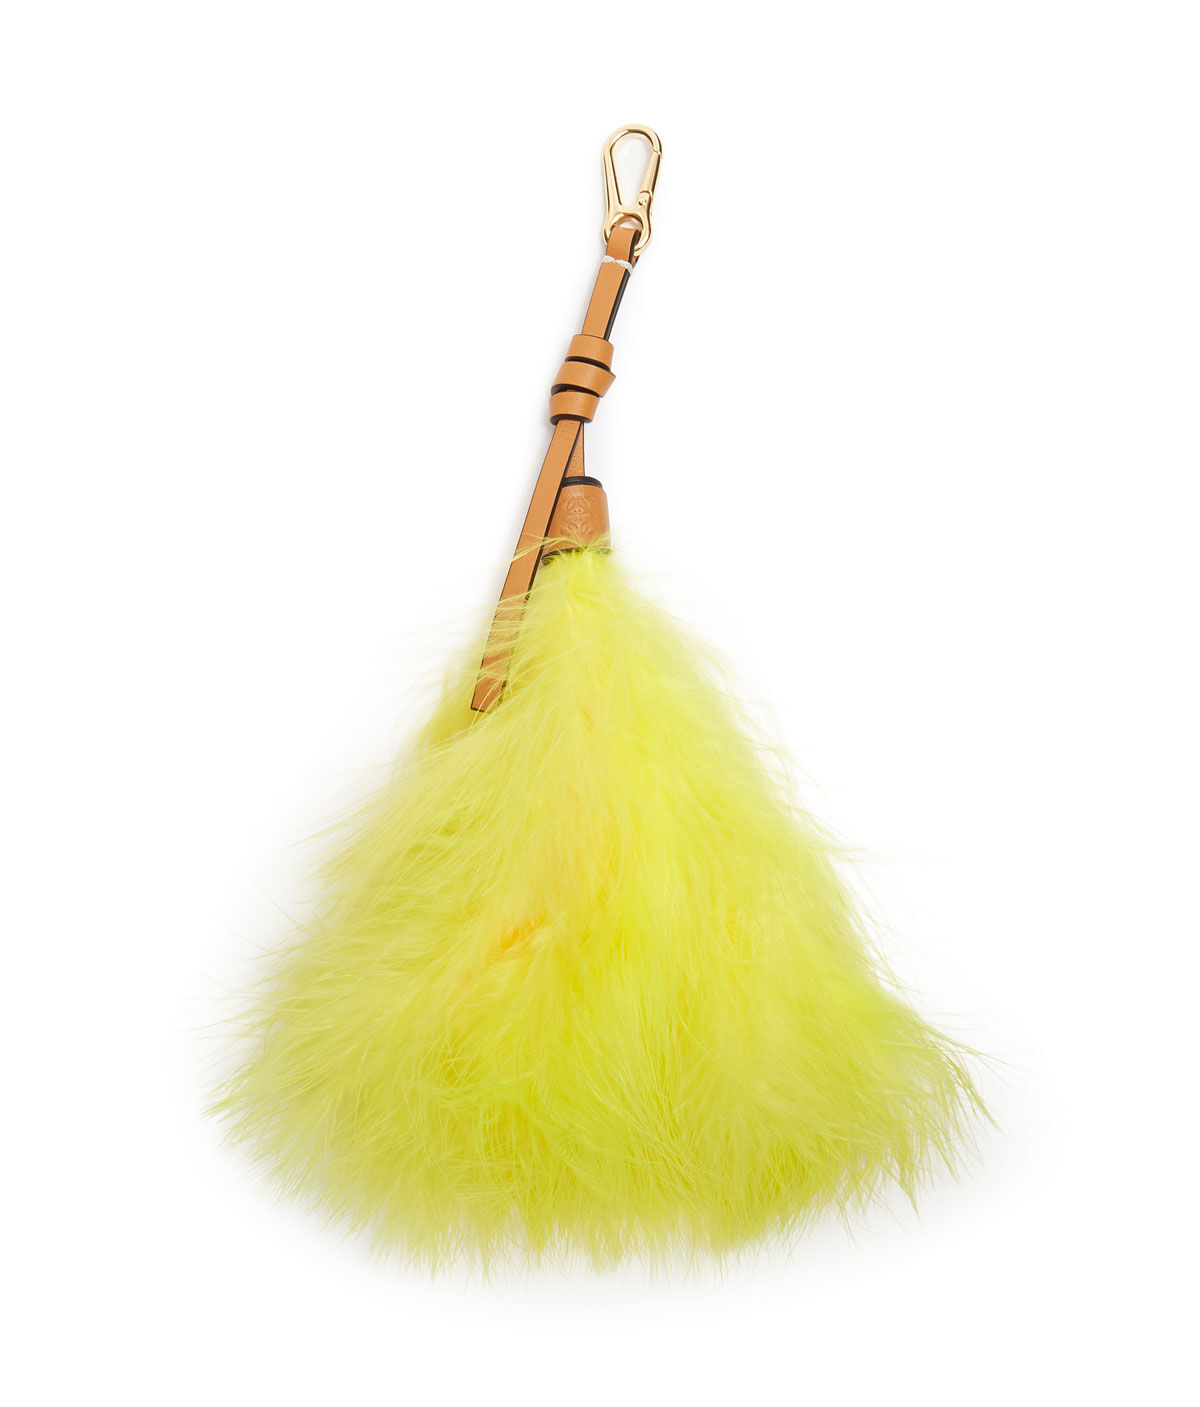 LOEWE Feather Charm Yellow all